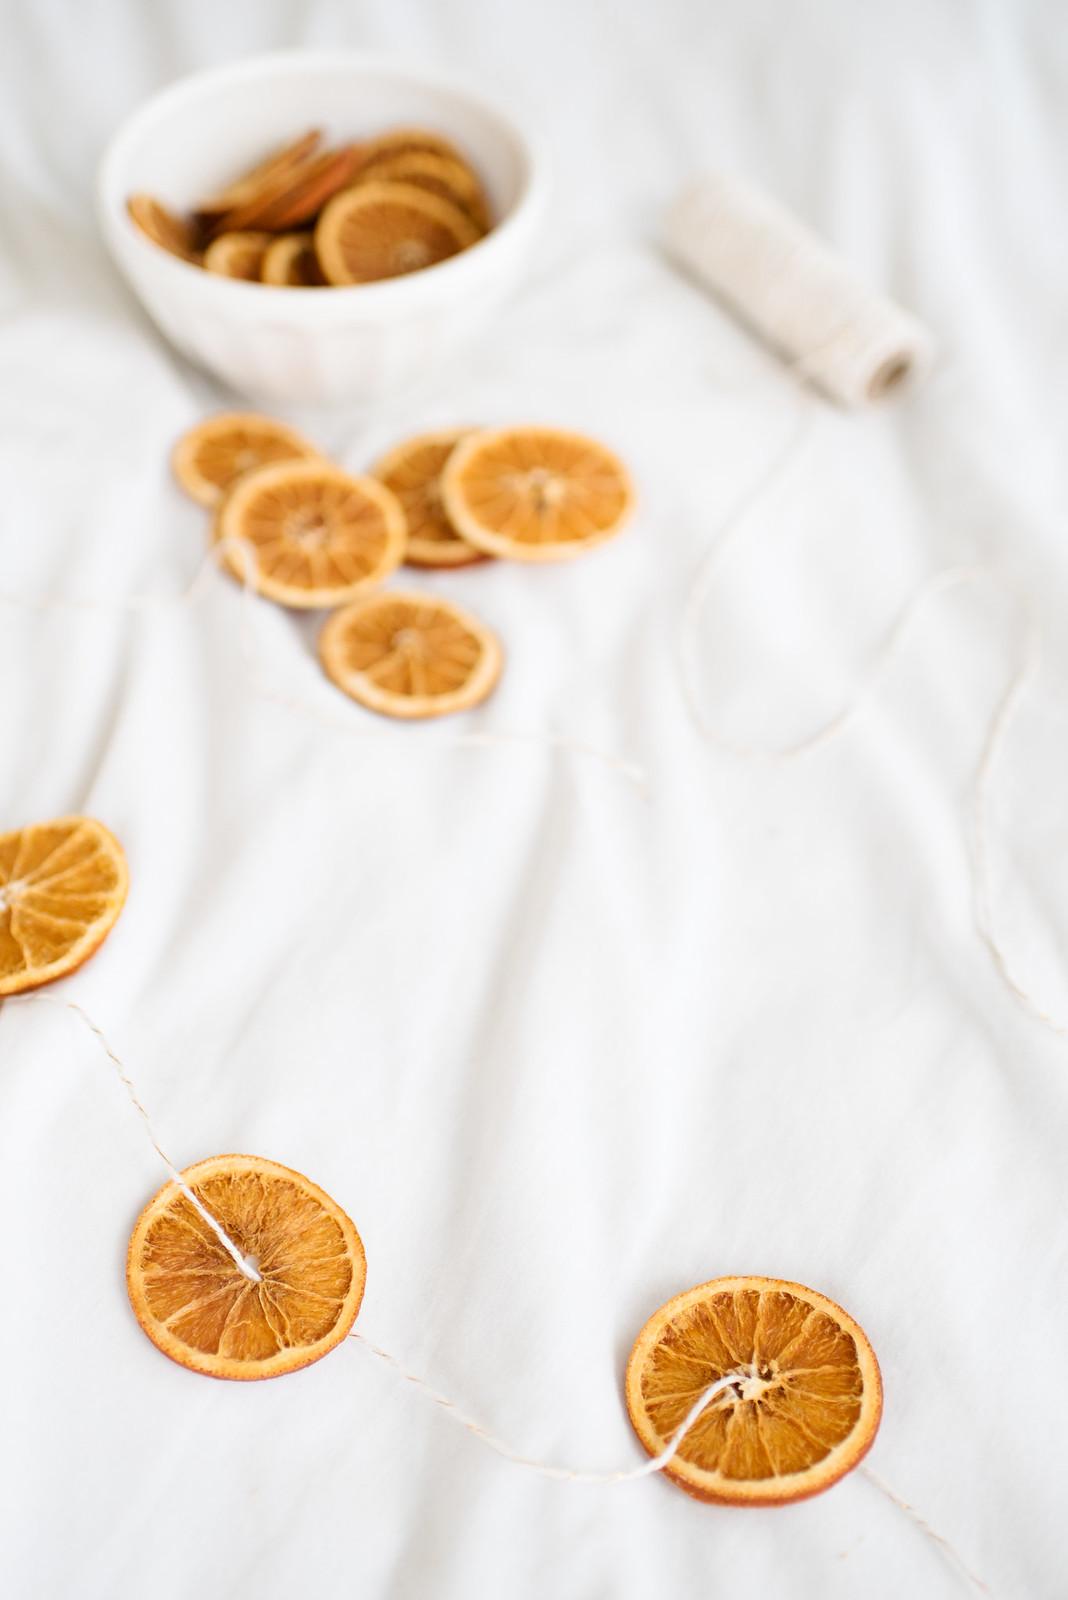 DIY Dried Oranges on juliettelaura.blogspot.com